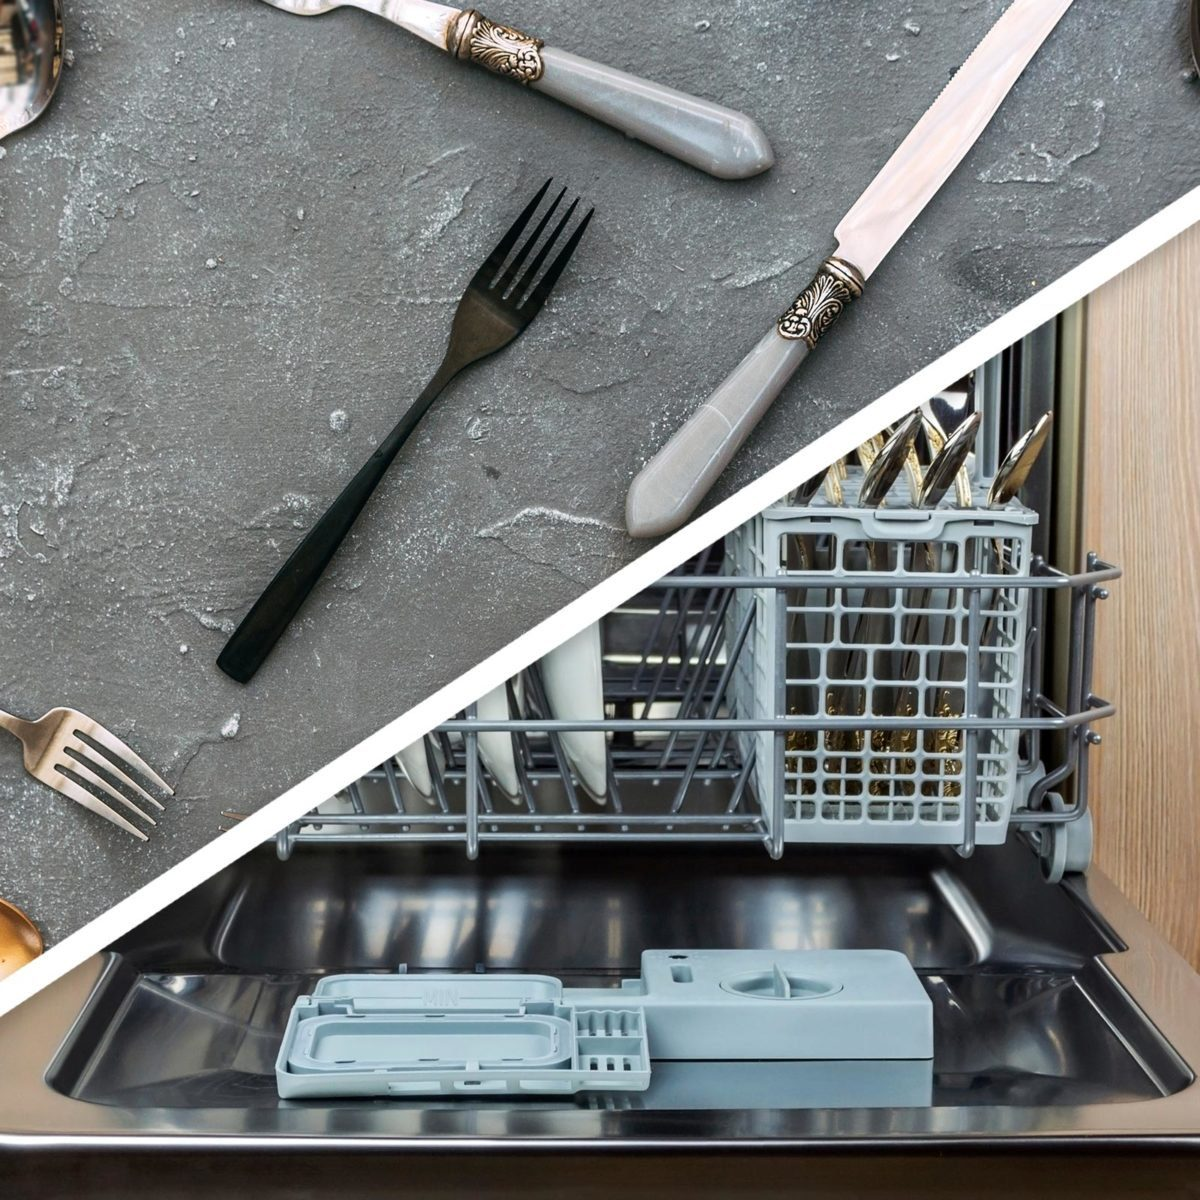 Silverware and dishwasher